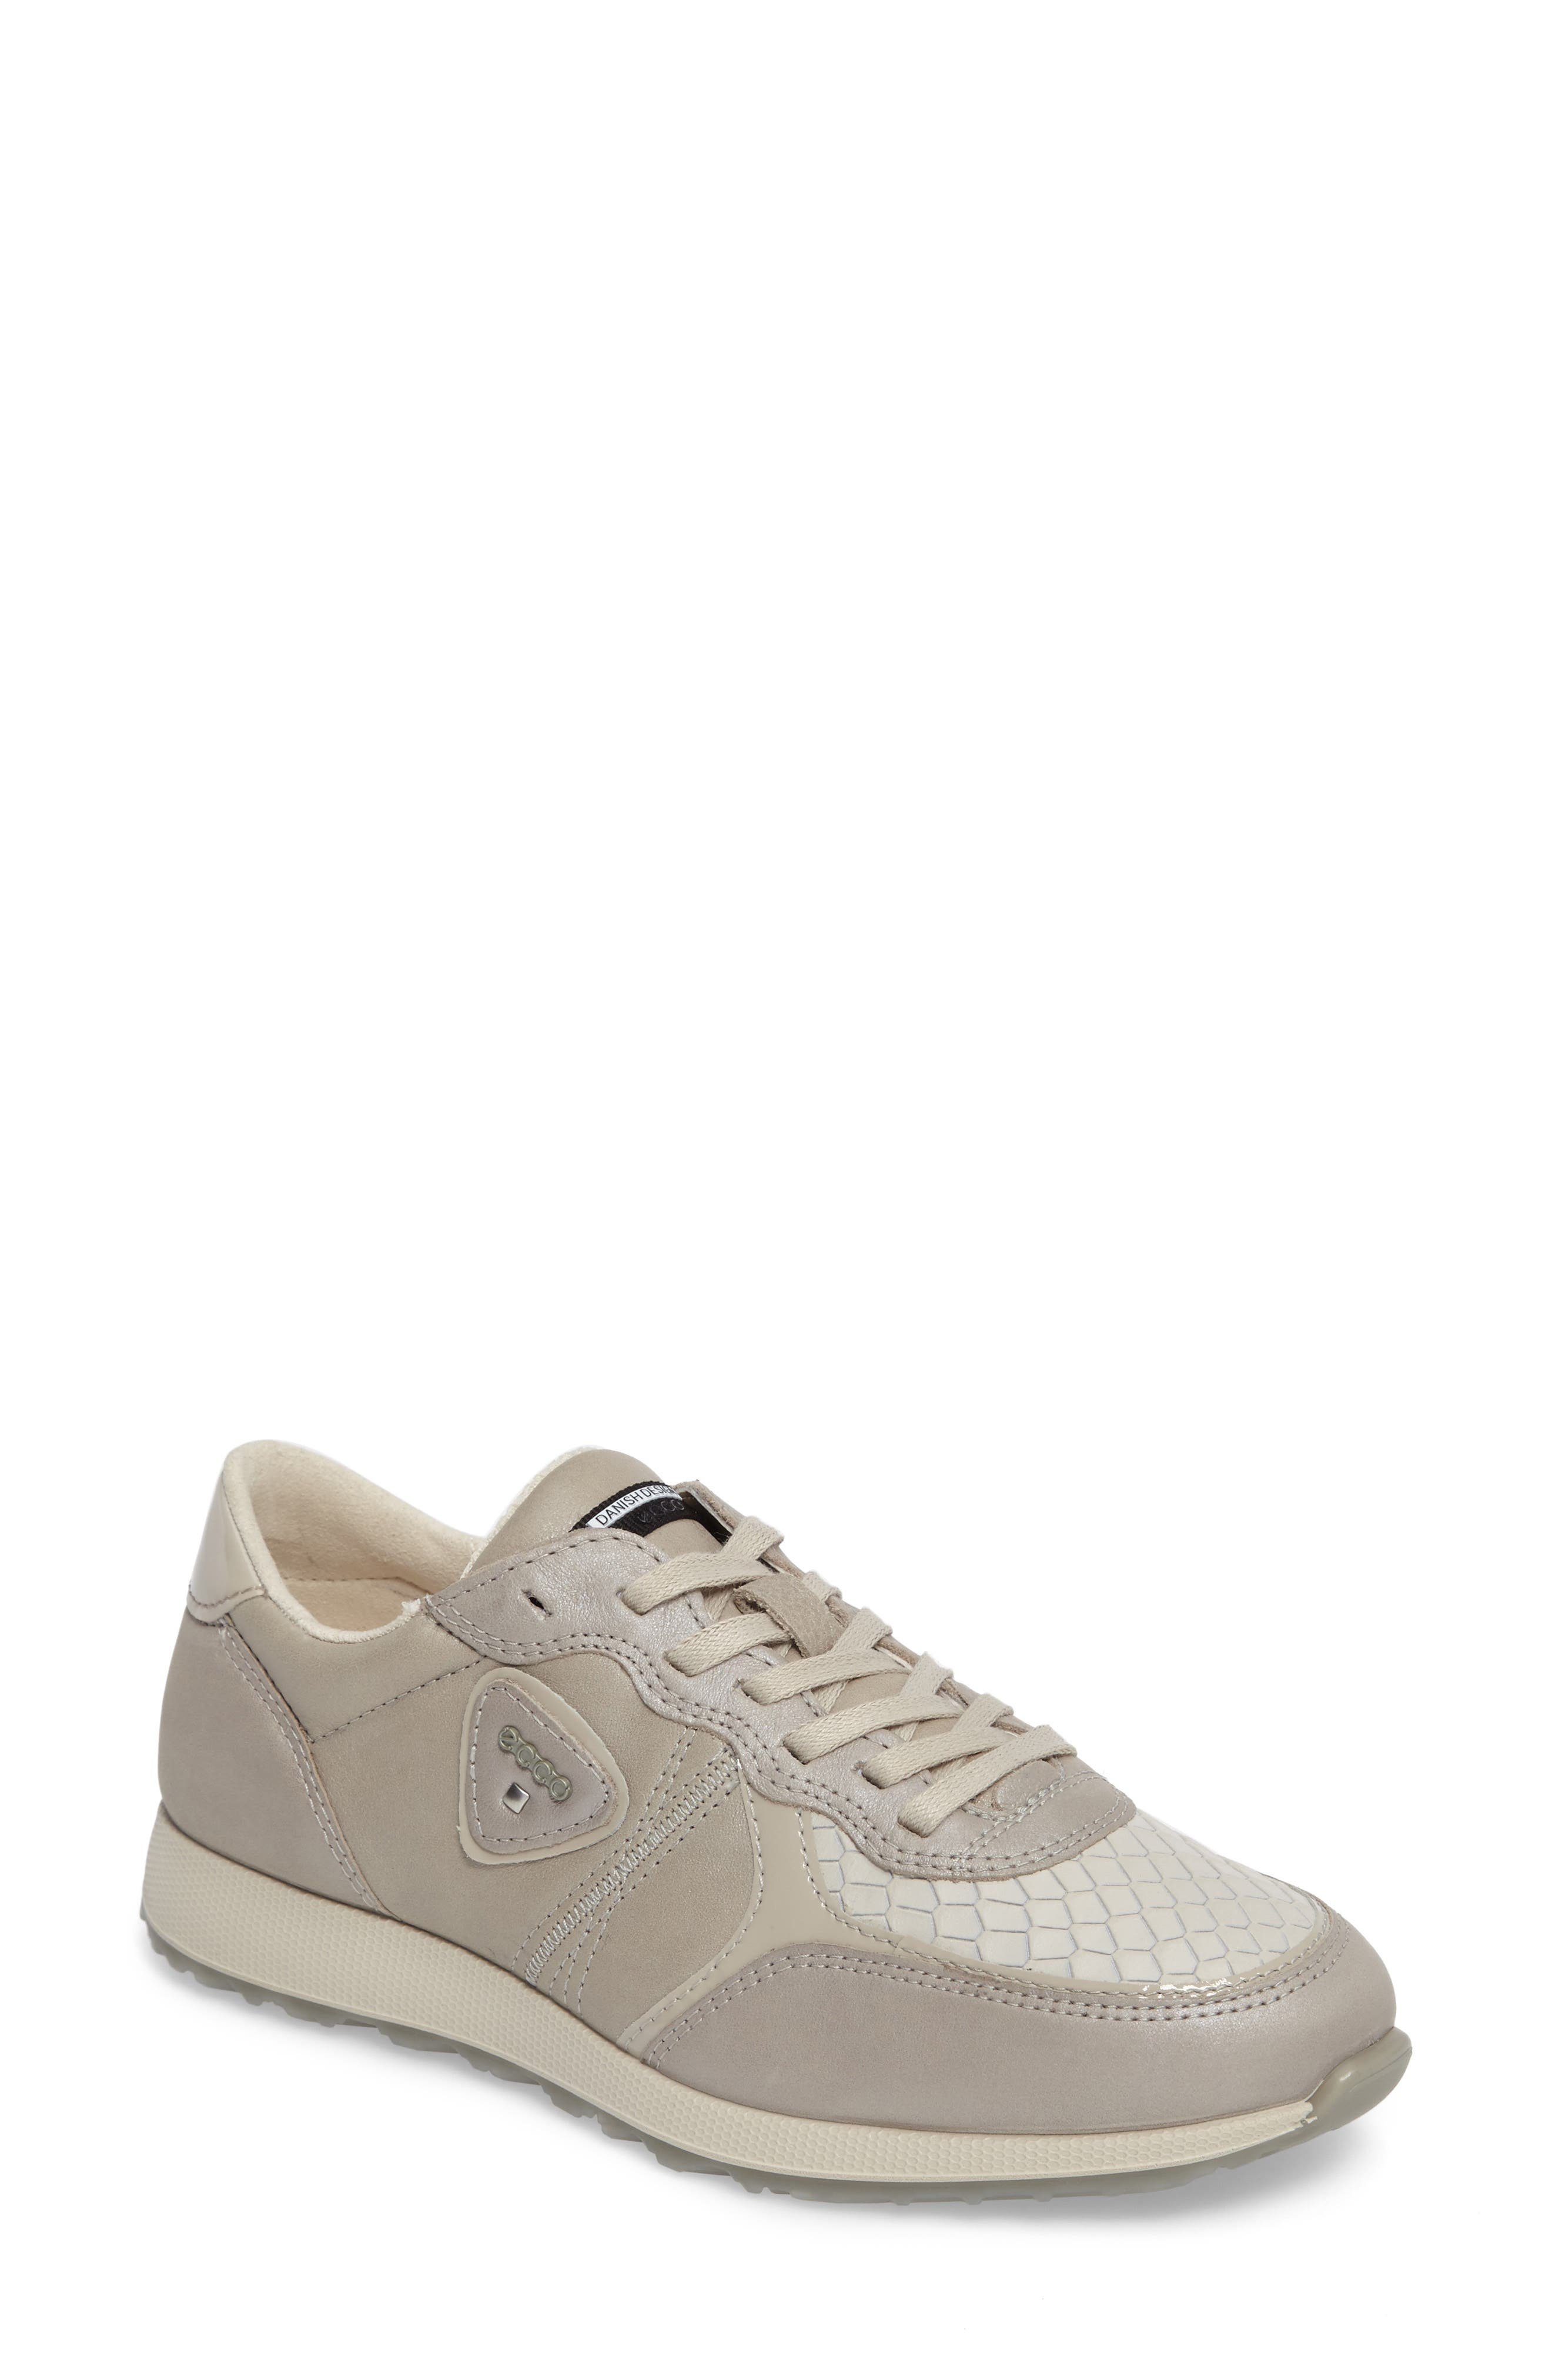 Retro Sneaker,                             Main thumbnail 1, color,                             GRAVEL/ WHITE LEATHER